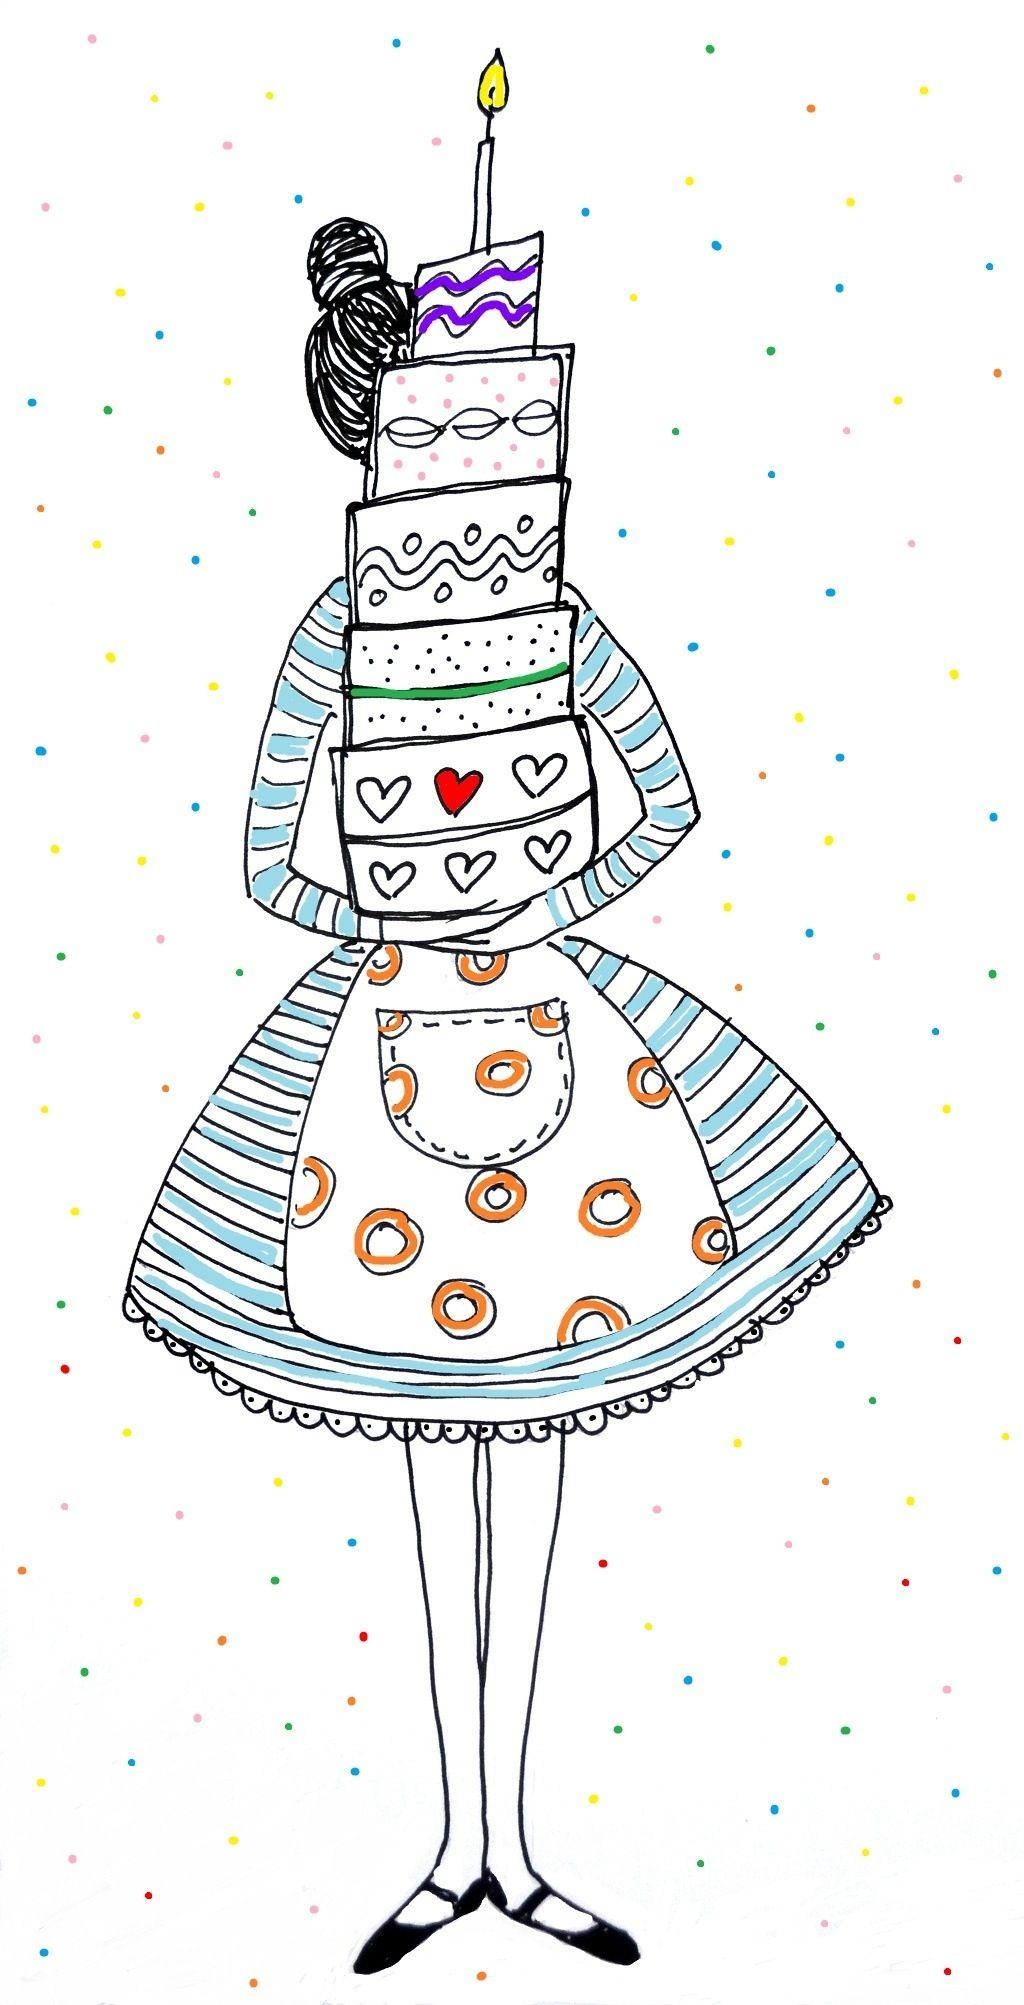 Happy Birthday Girl Illustration ~ Girl with birthday cake illustration my soul pinterest illustrations